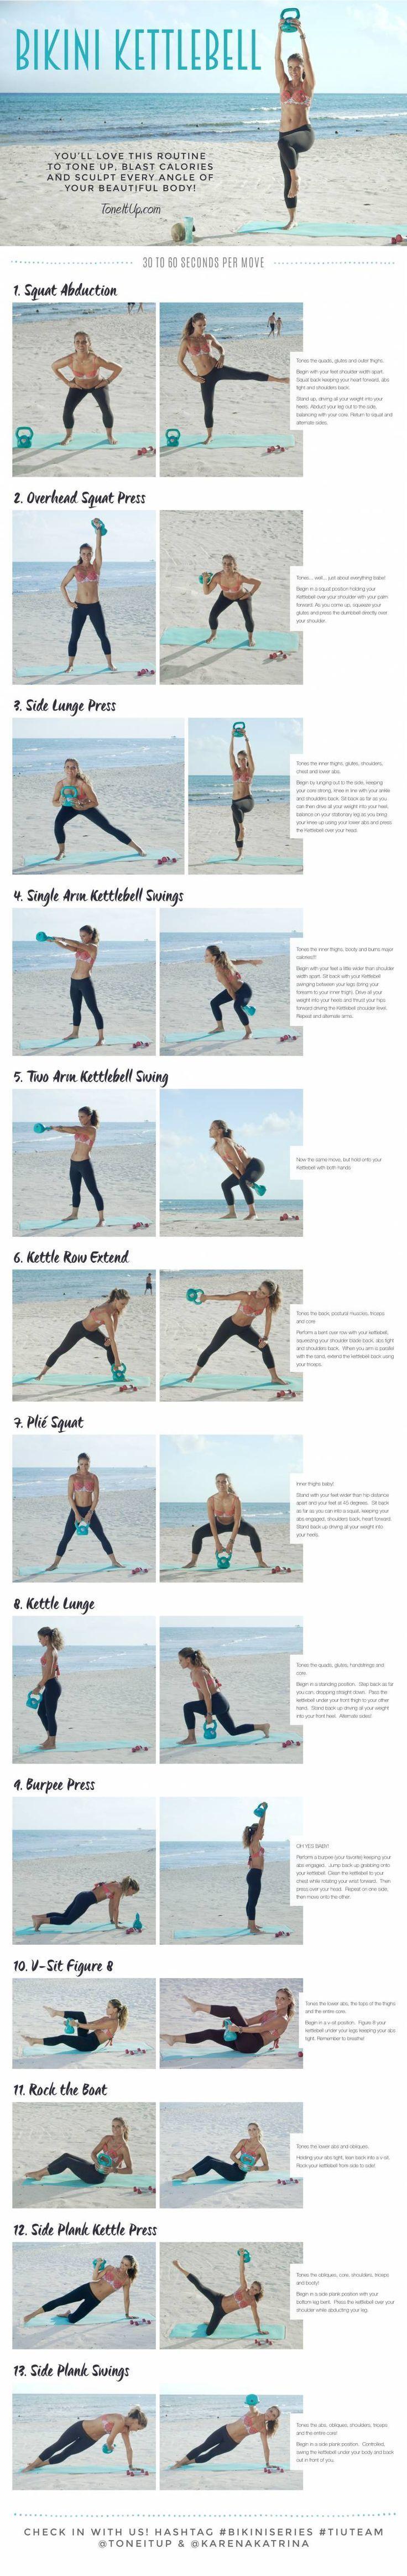 NEW Workout ~ BIKINI KETTLEBELL!